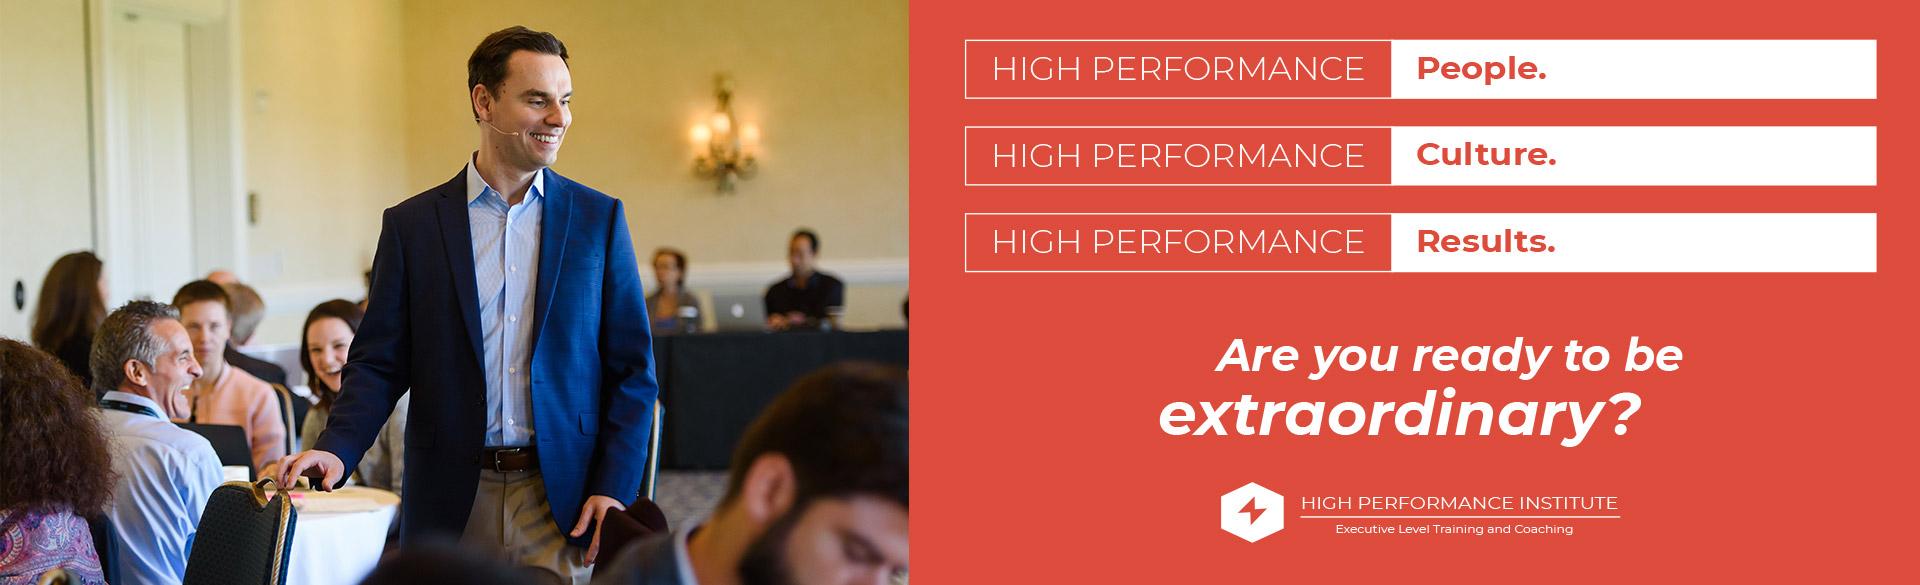 Brendon Burchard High Performance Insitute HPI Banner